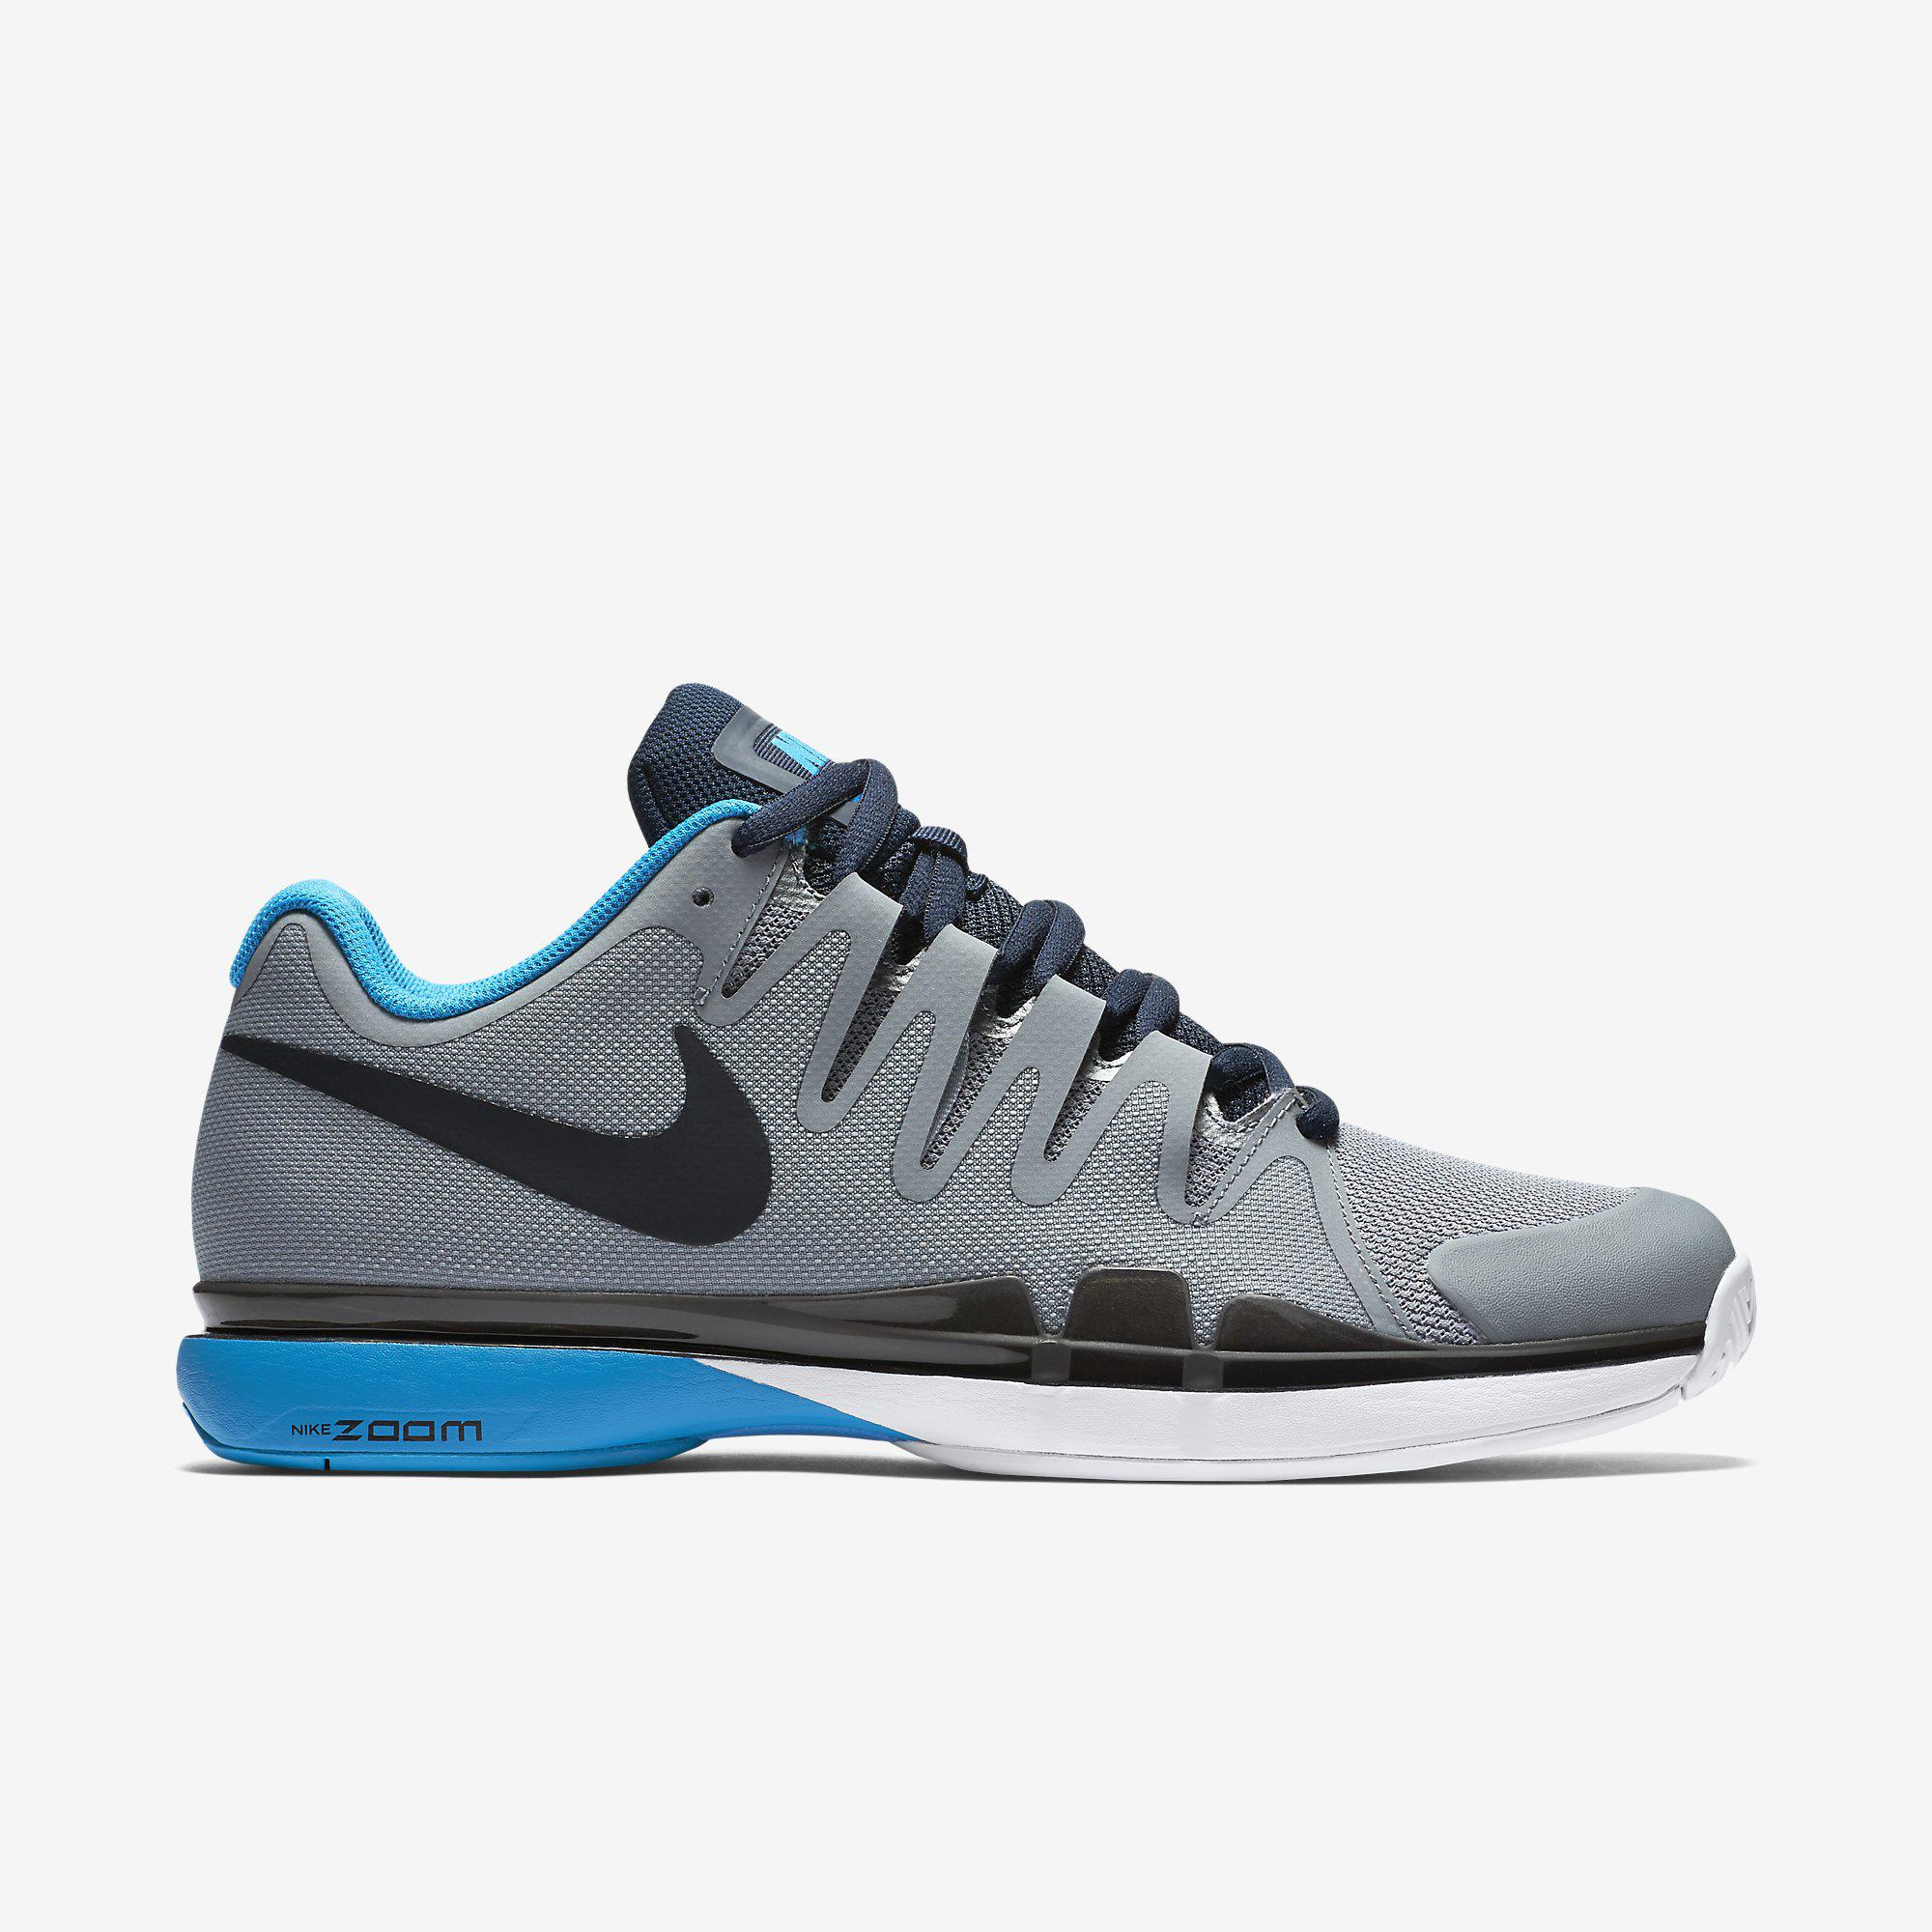 todas las tallas aaa descuento Nike Zoom Vapor Para Hombre Zapatillas De Tenis 9.5 Turísticos - Gris / Azul vn3yaY